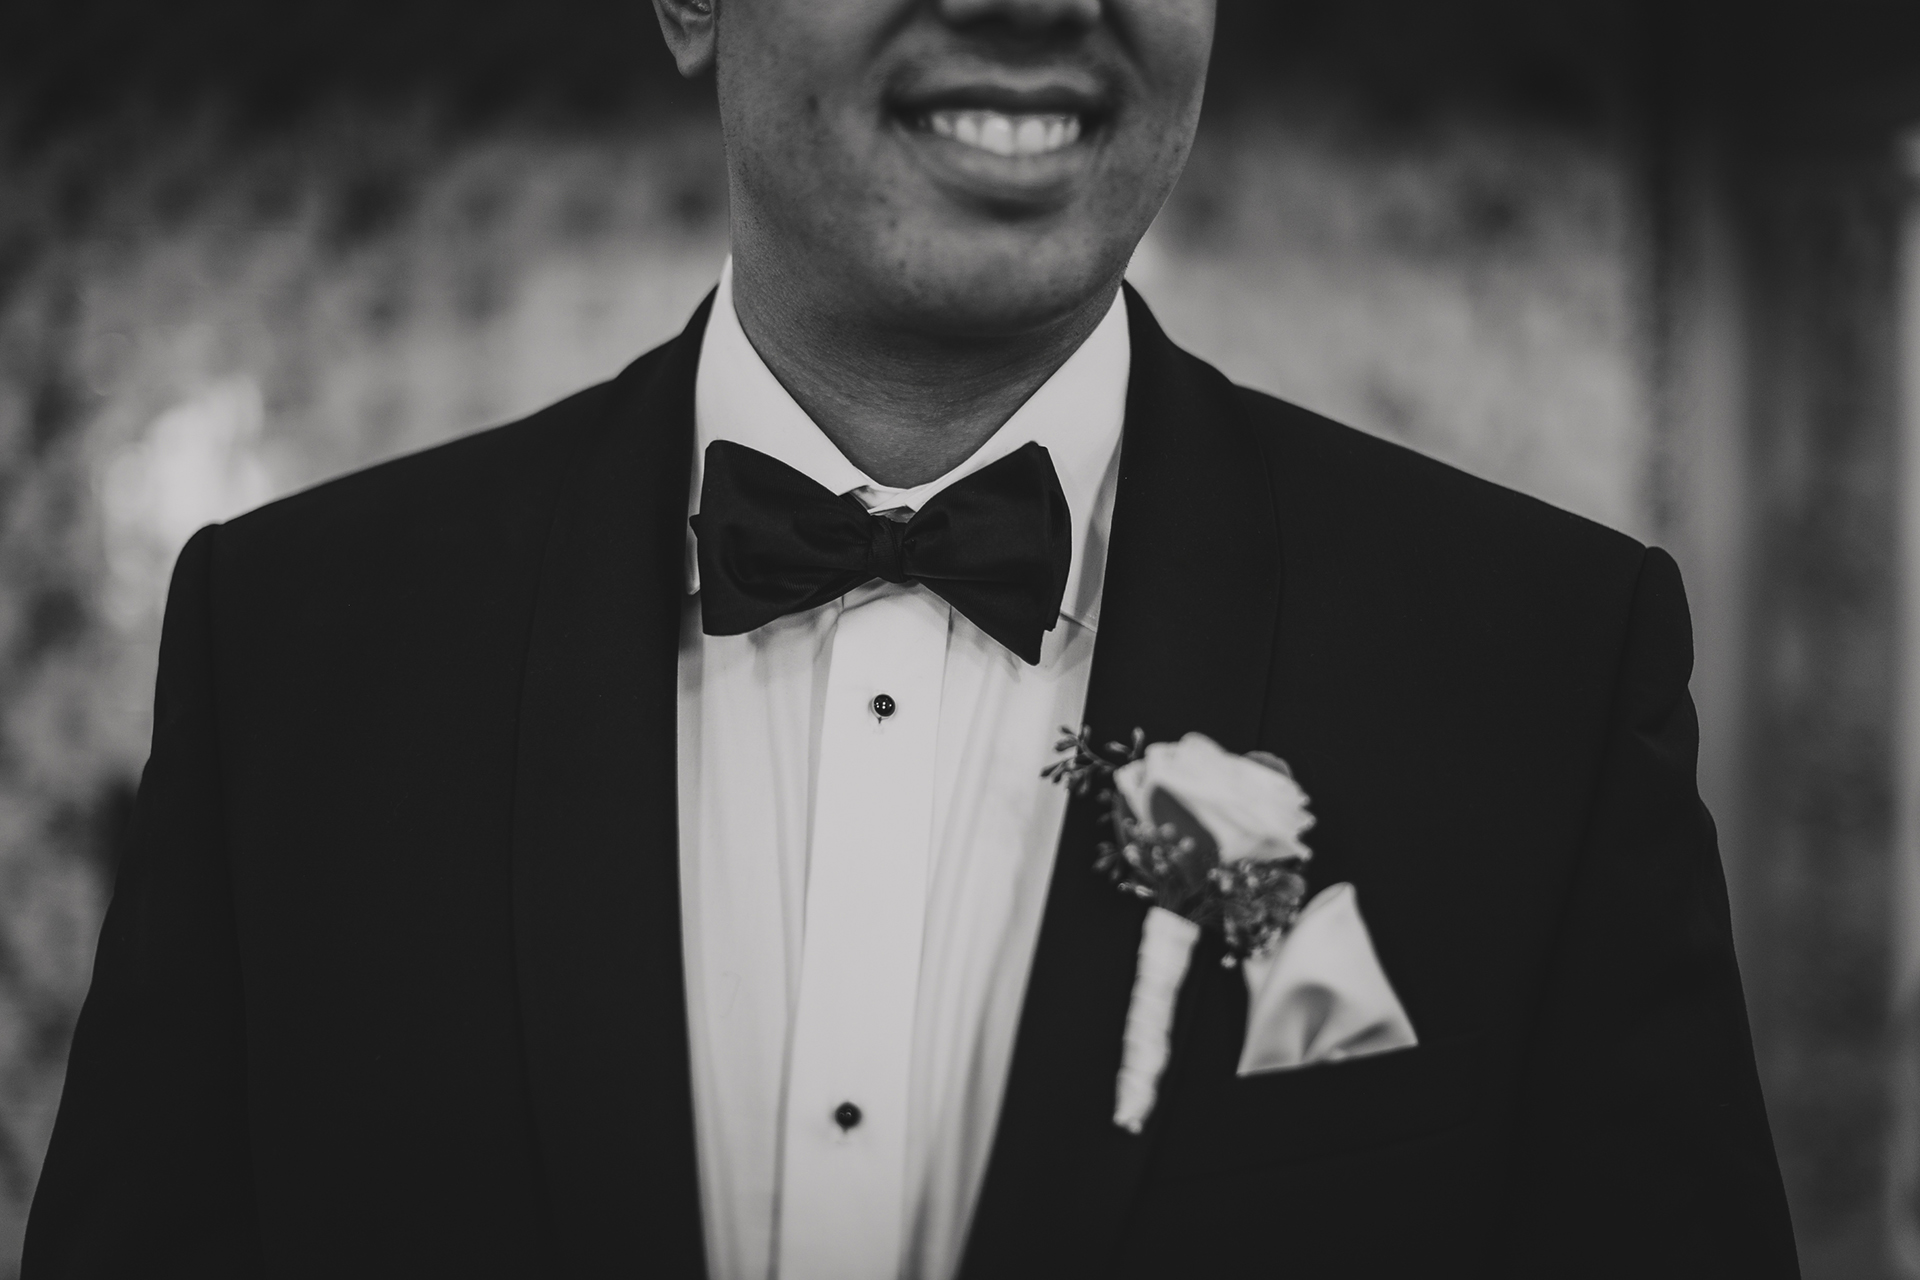 Hochzeitsreportage_J&D_056_Caroline Queda Fotografie